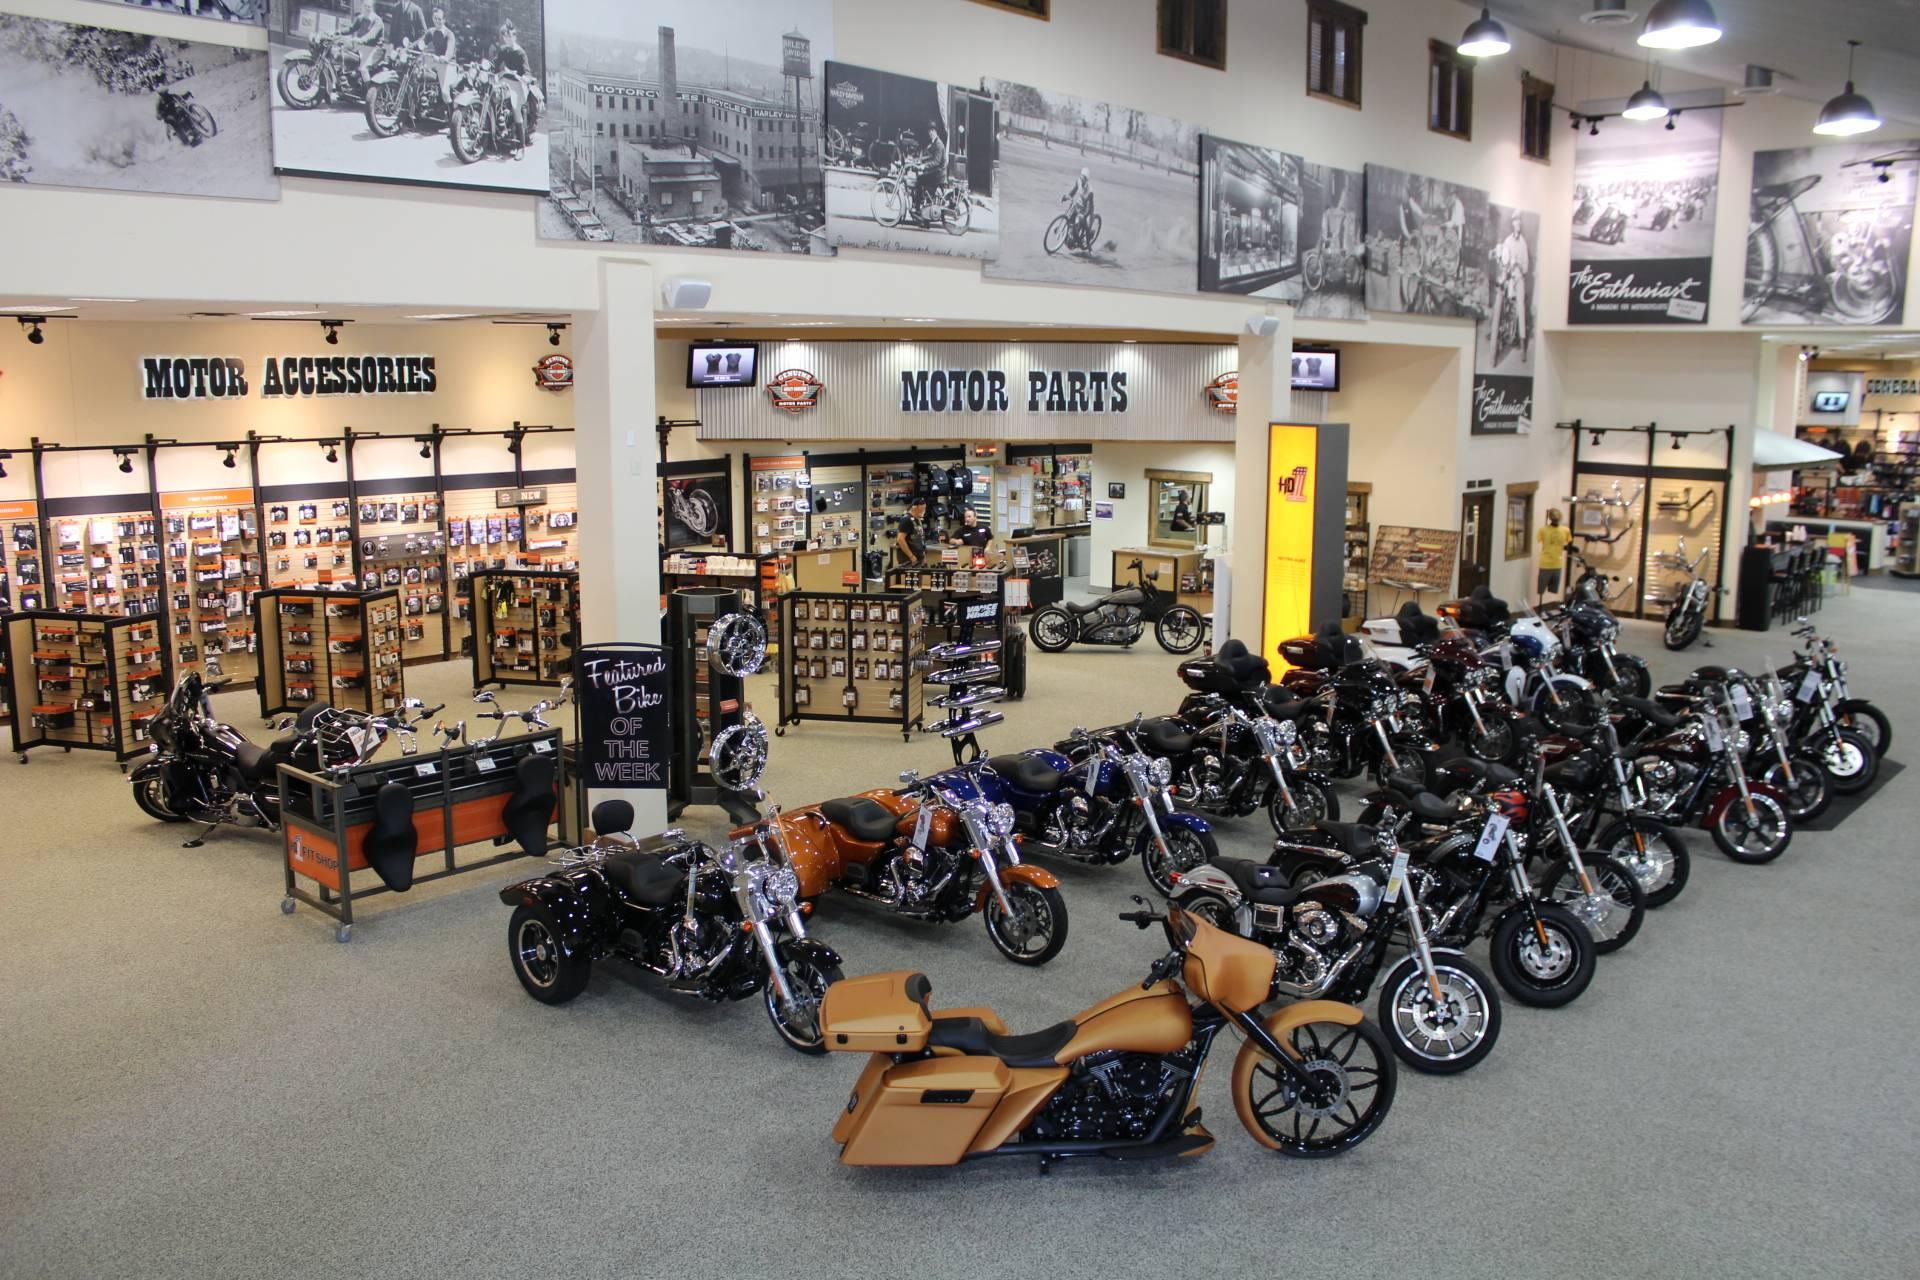 2015 Harley Davidson Cvo Street Glide Motorcycles Apache Junction Power Wheels Parts In Arizona